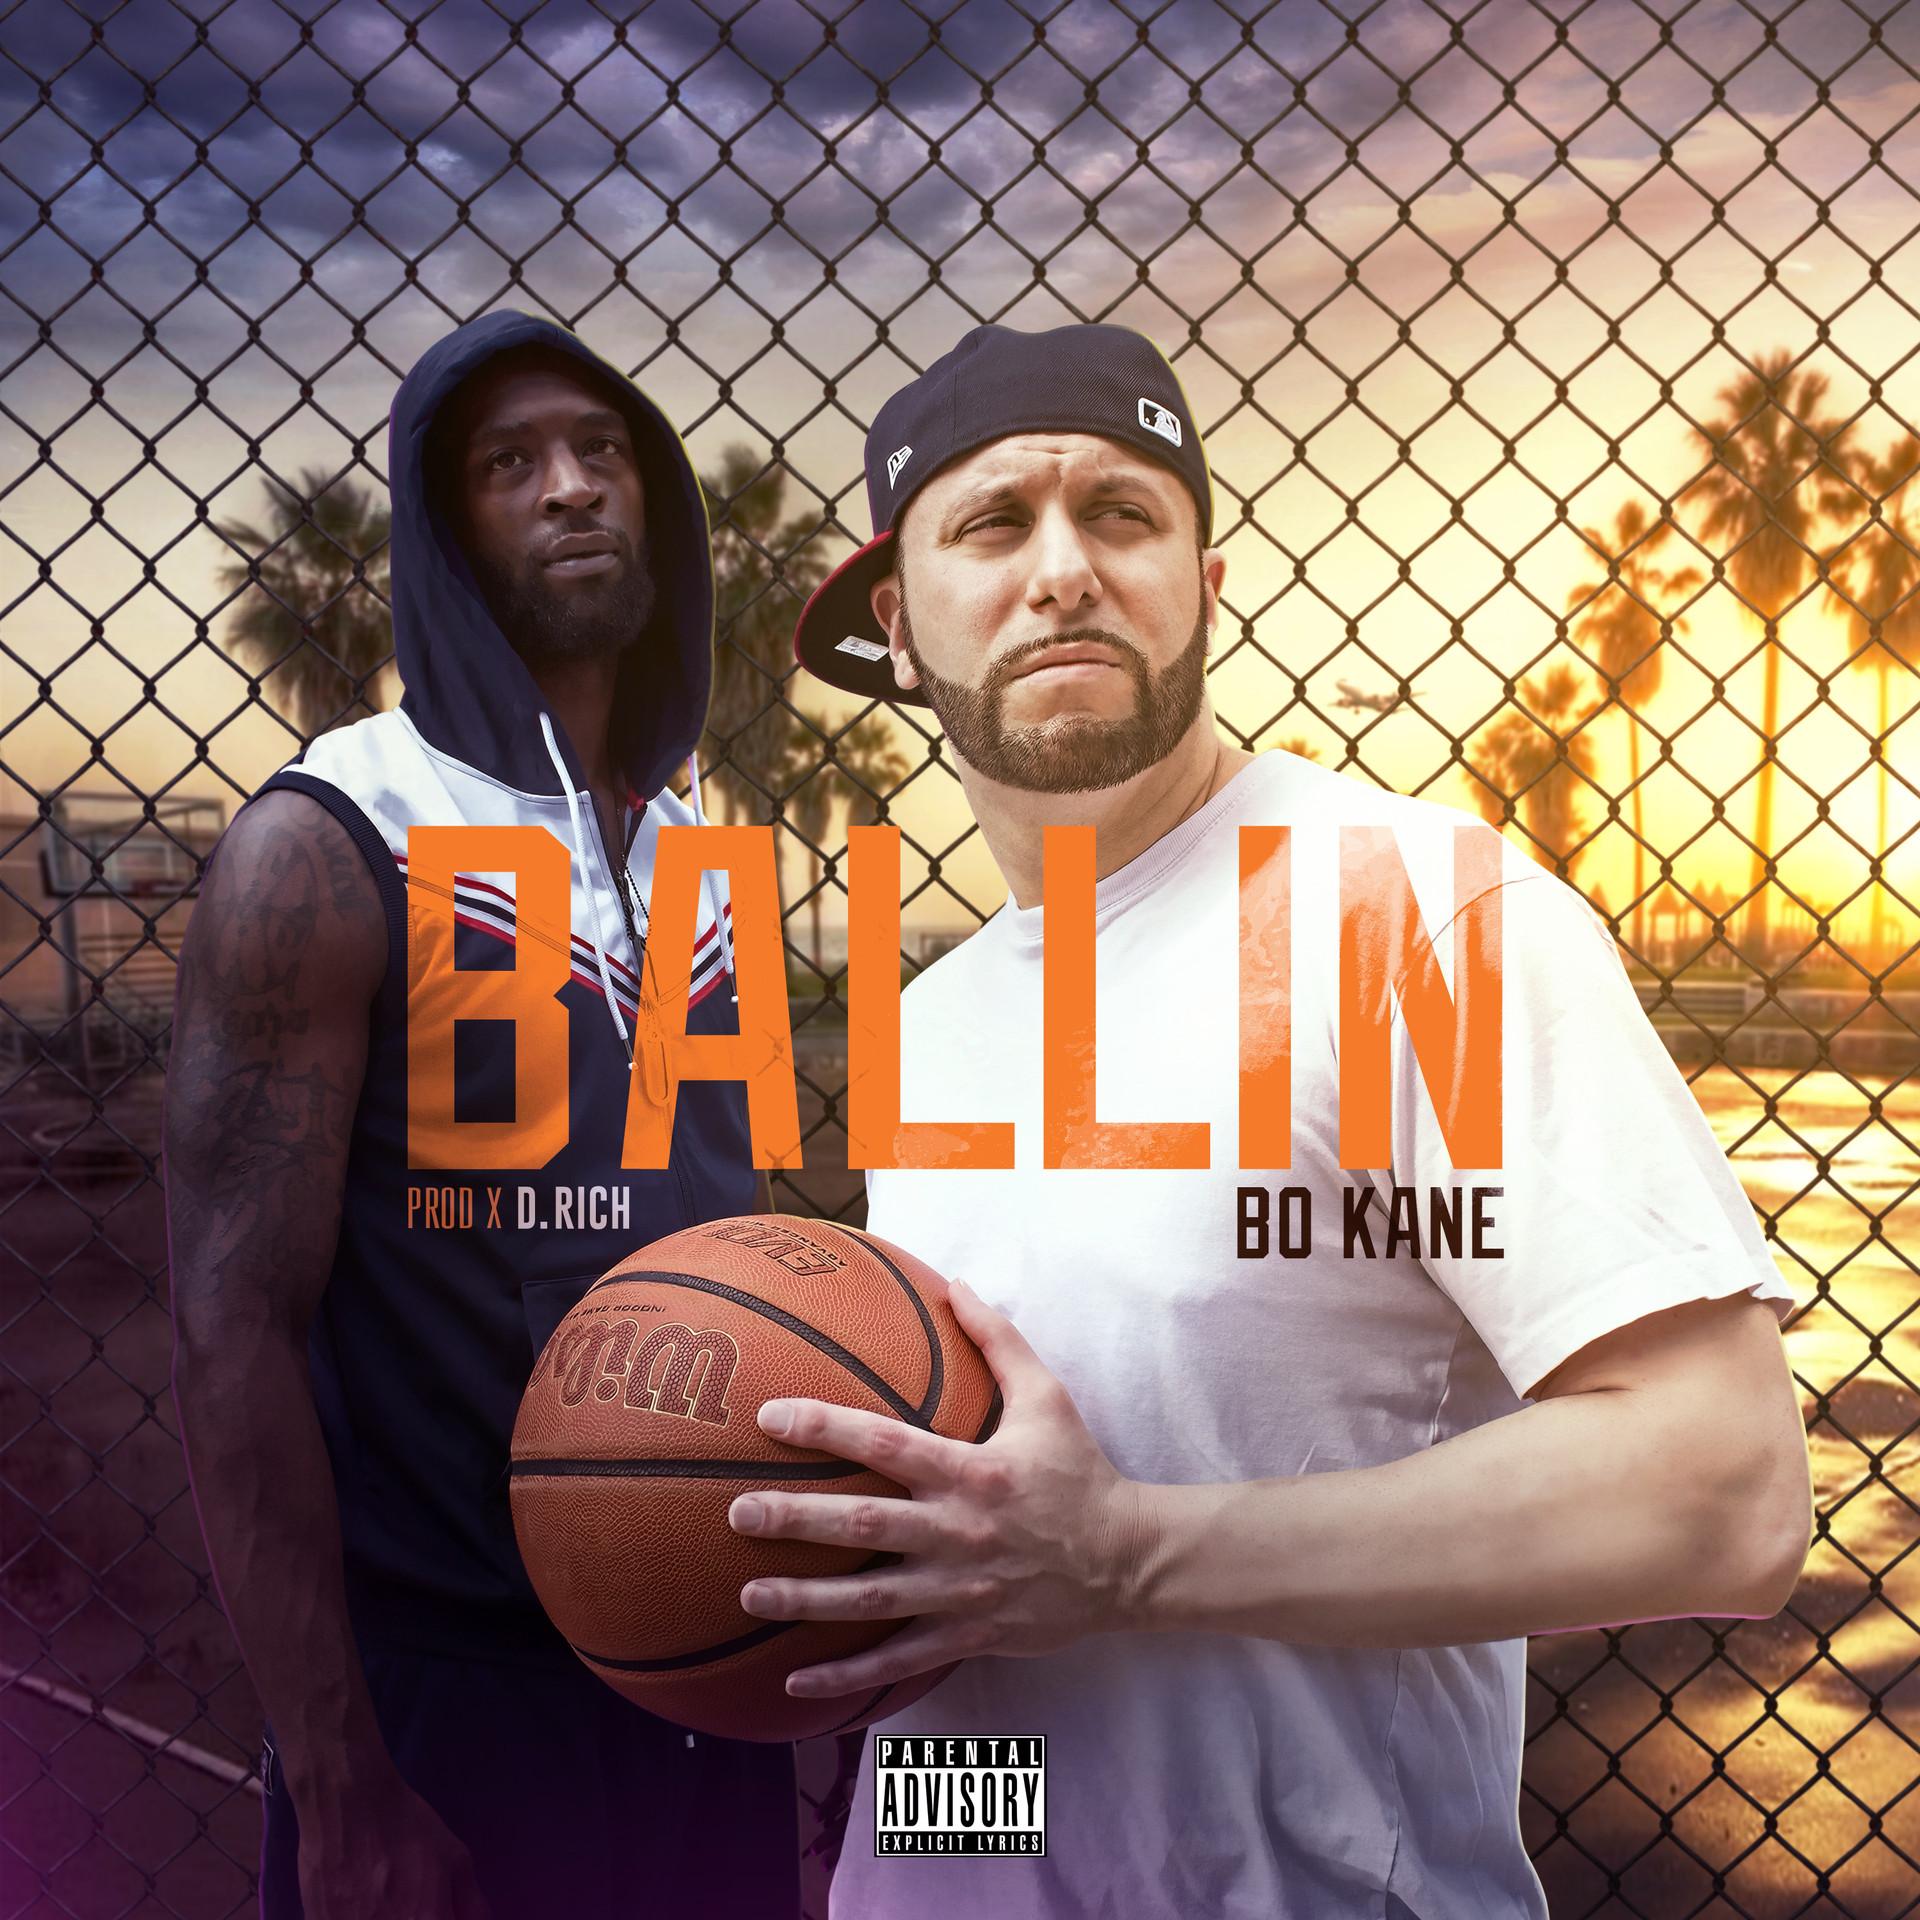 Ballin_coverart.jpg